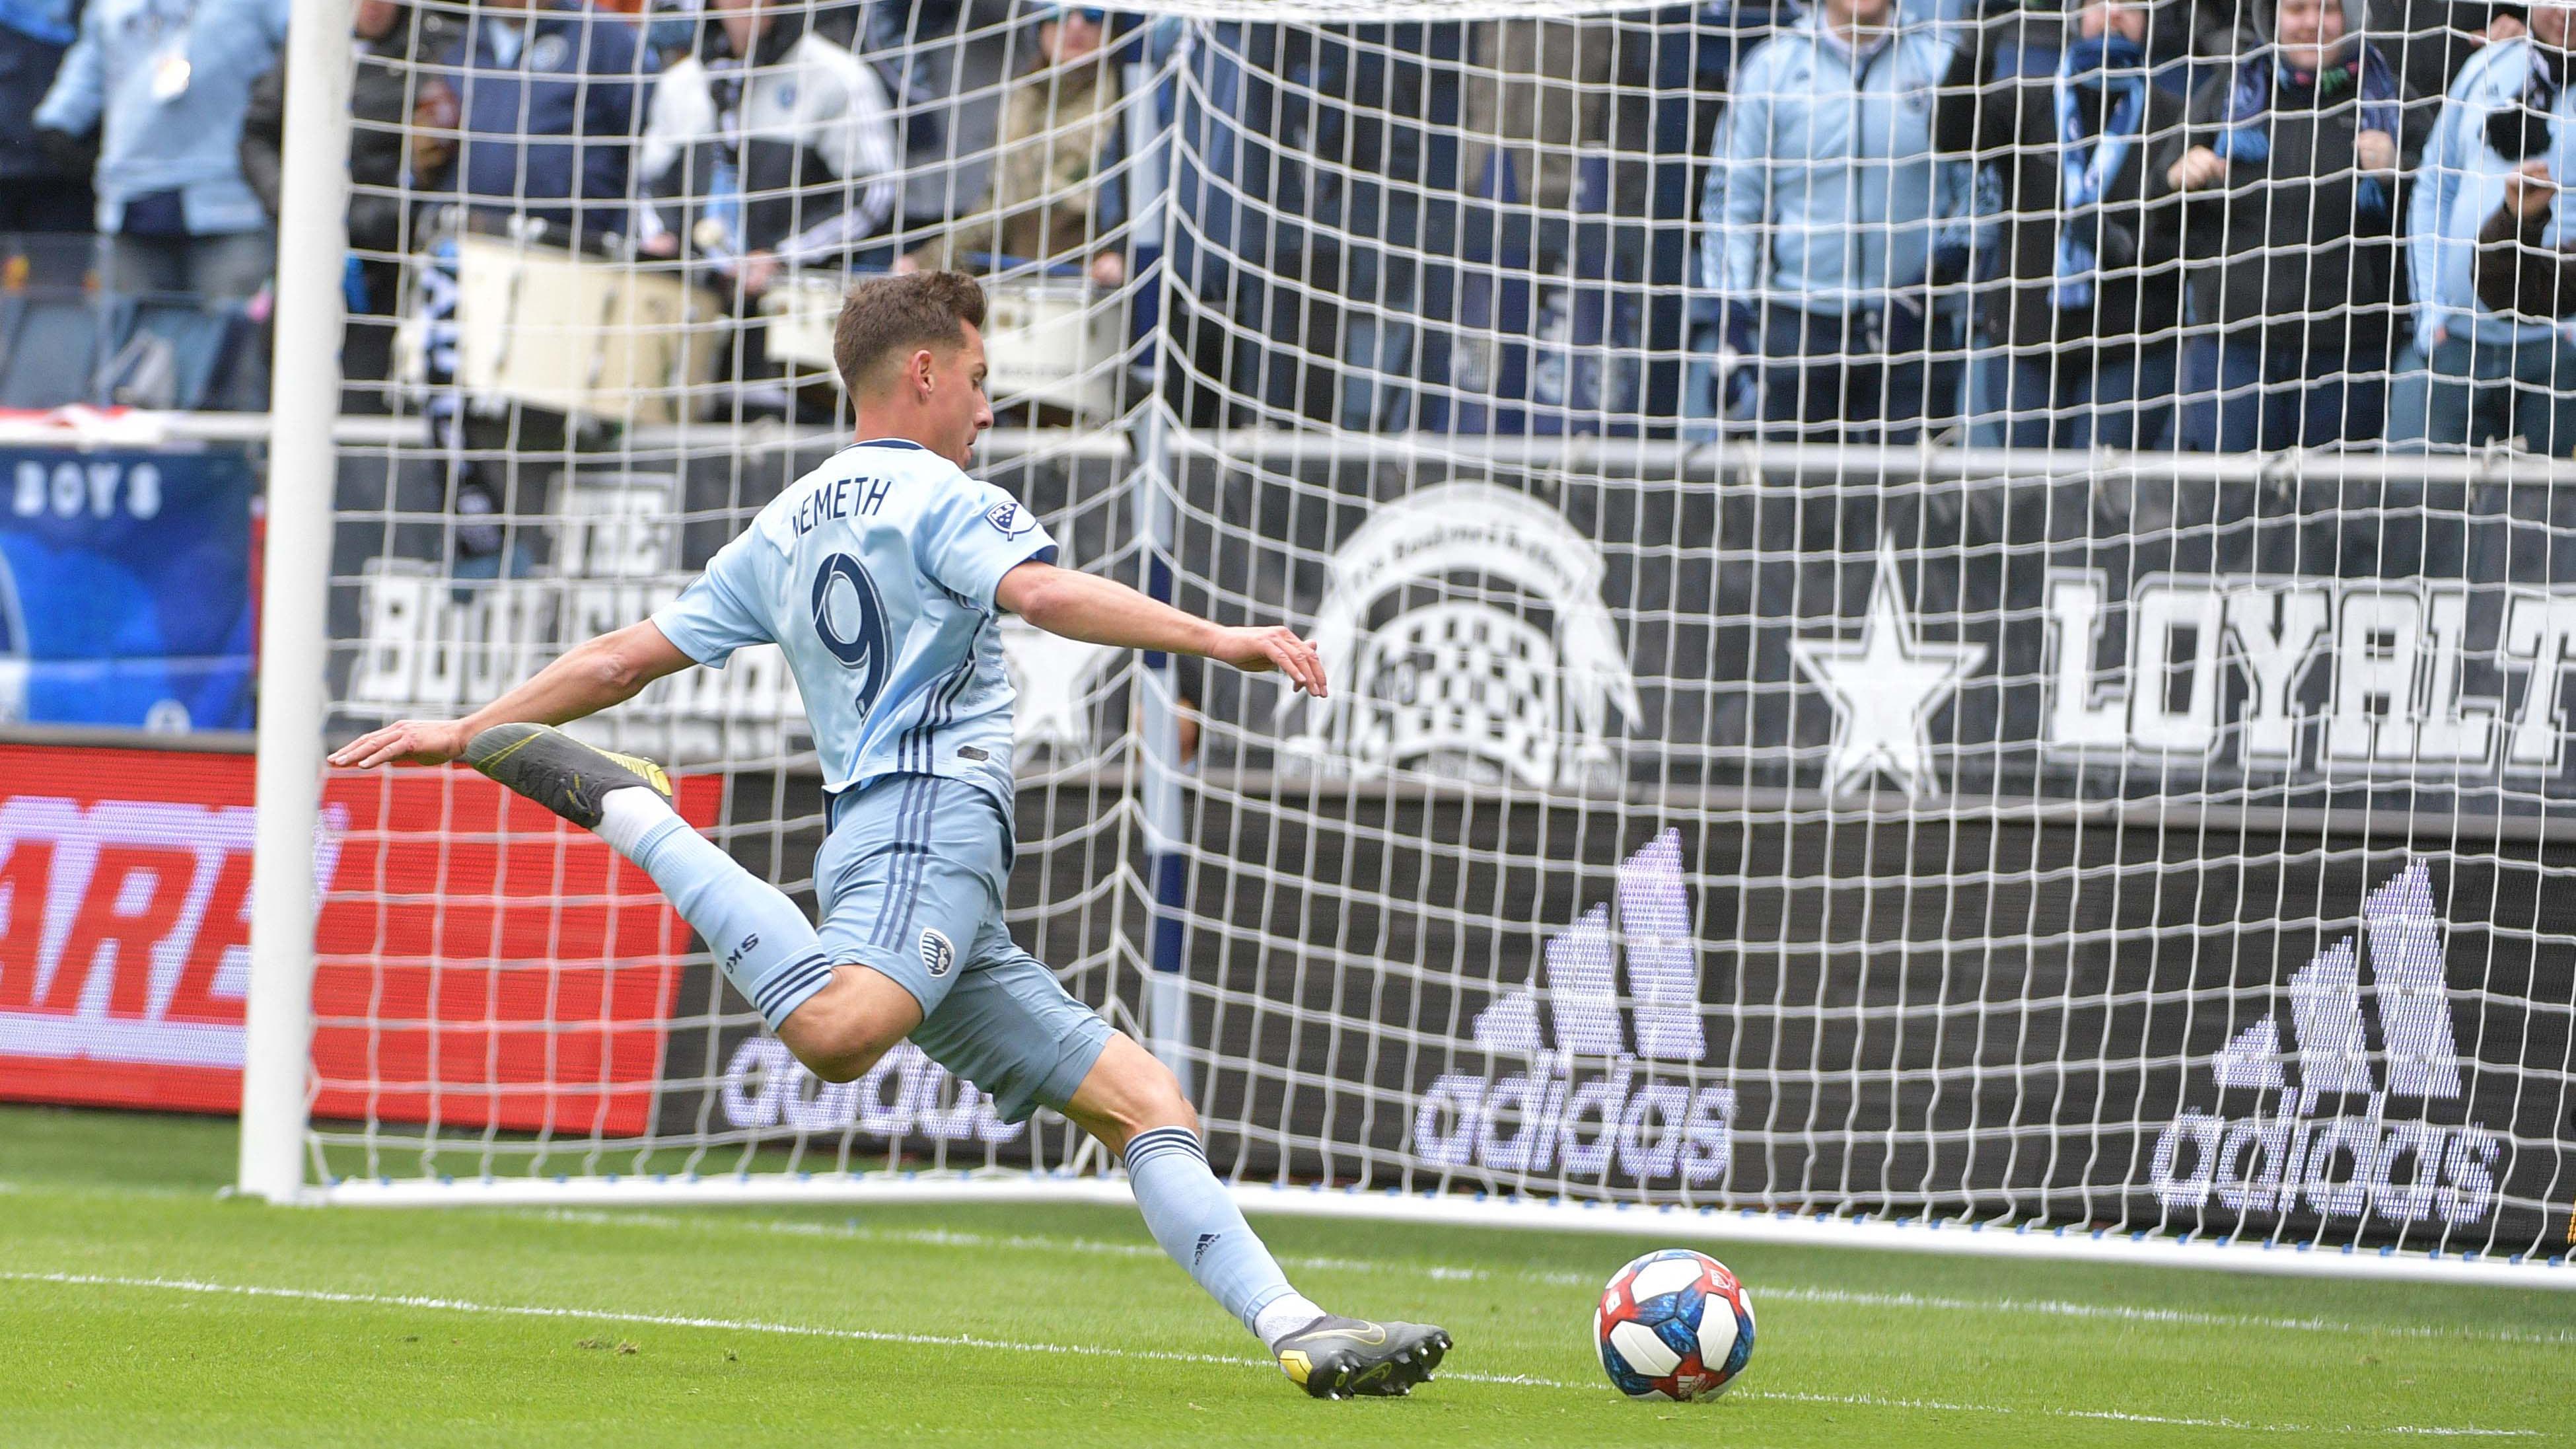 Nemeth's scoring surge powers Sporting KC to early success